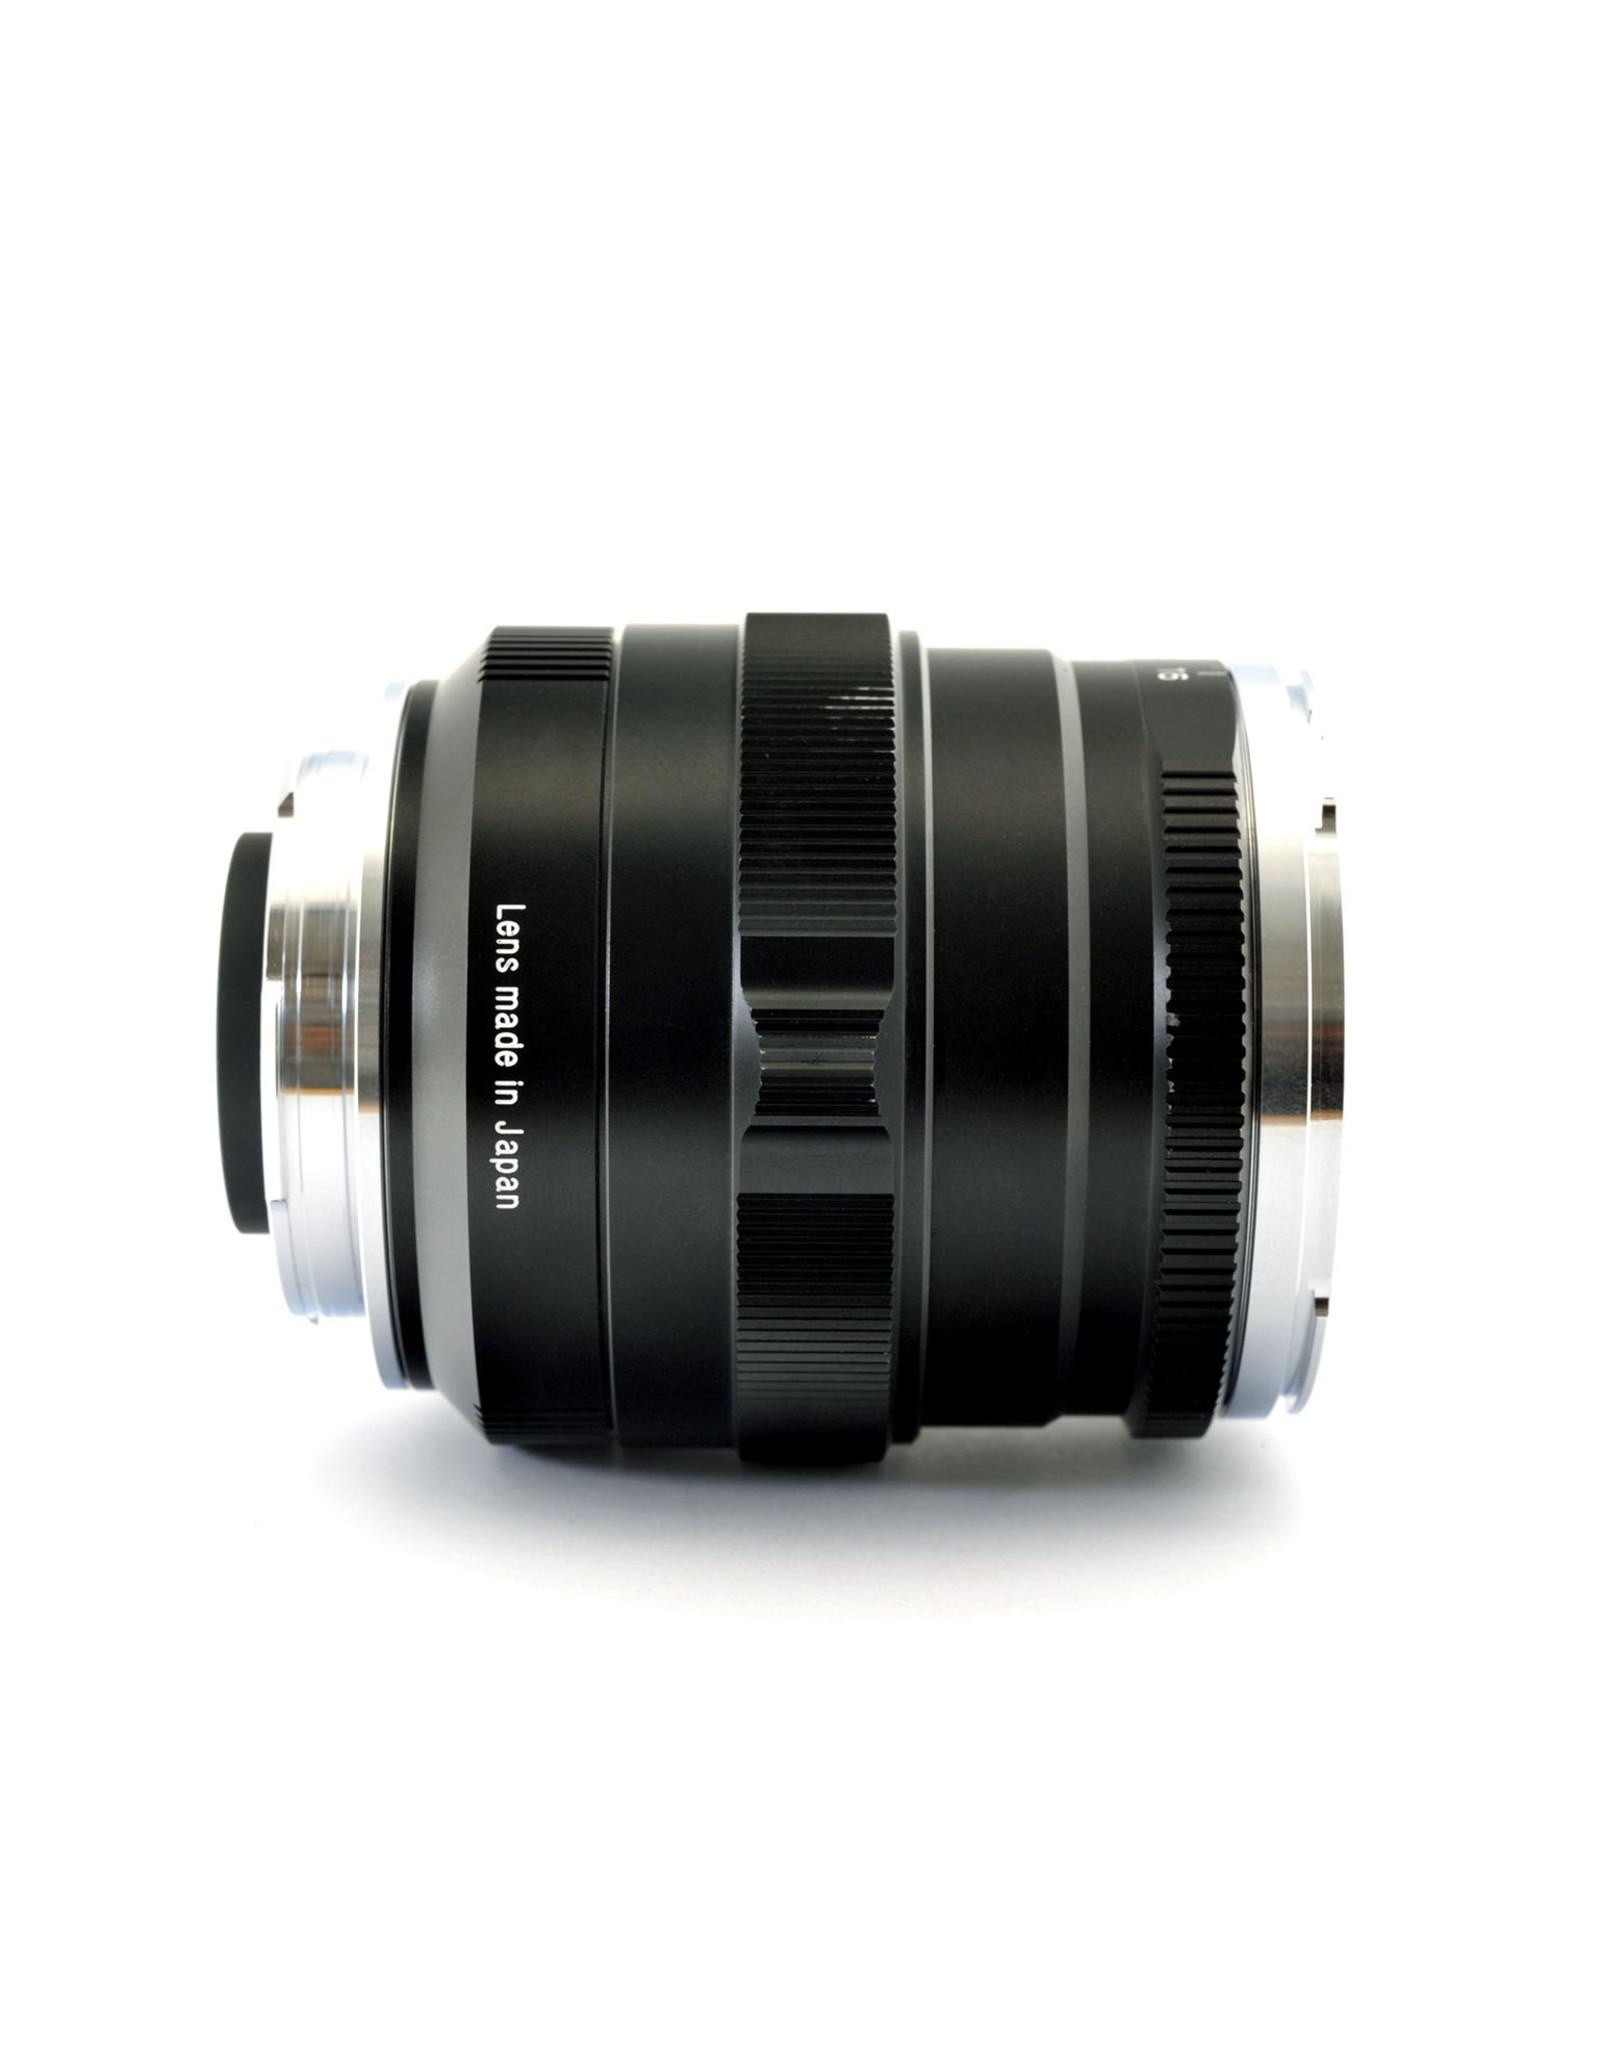 Zeiss Zeiss 35mm f1.4 Distagon ZMT*   AP1100707